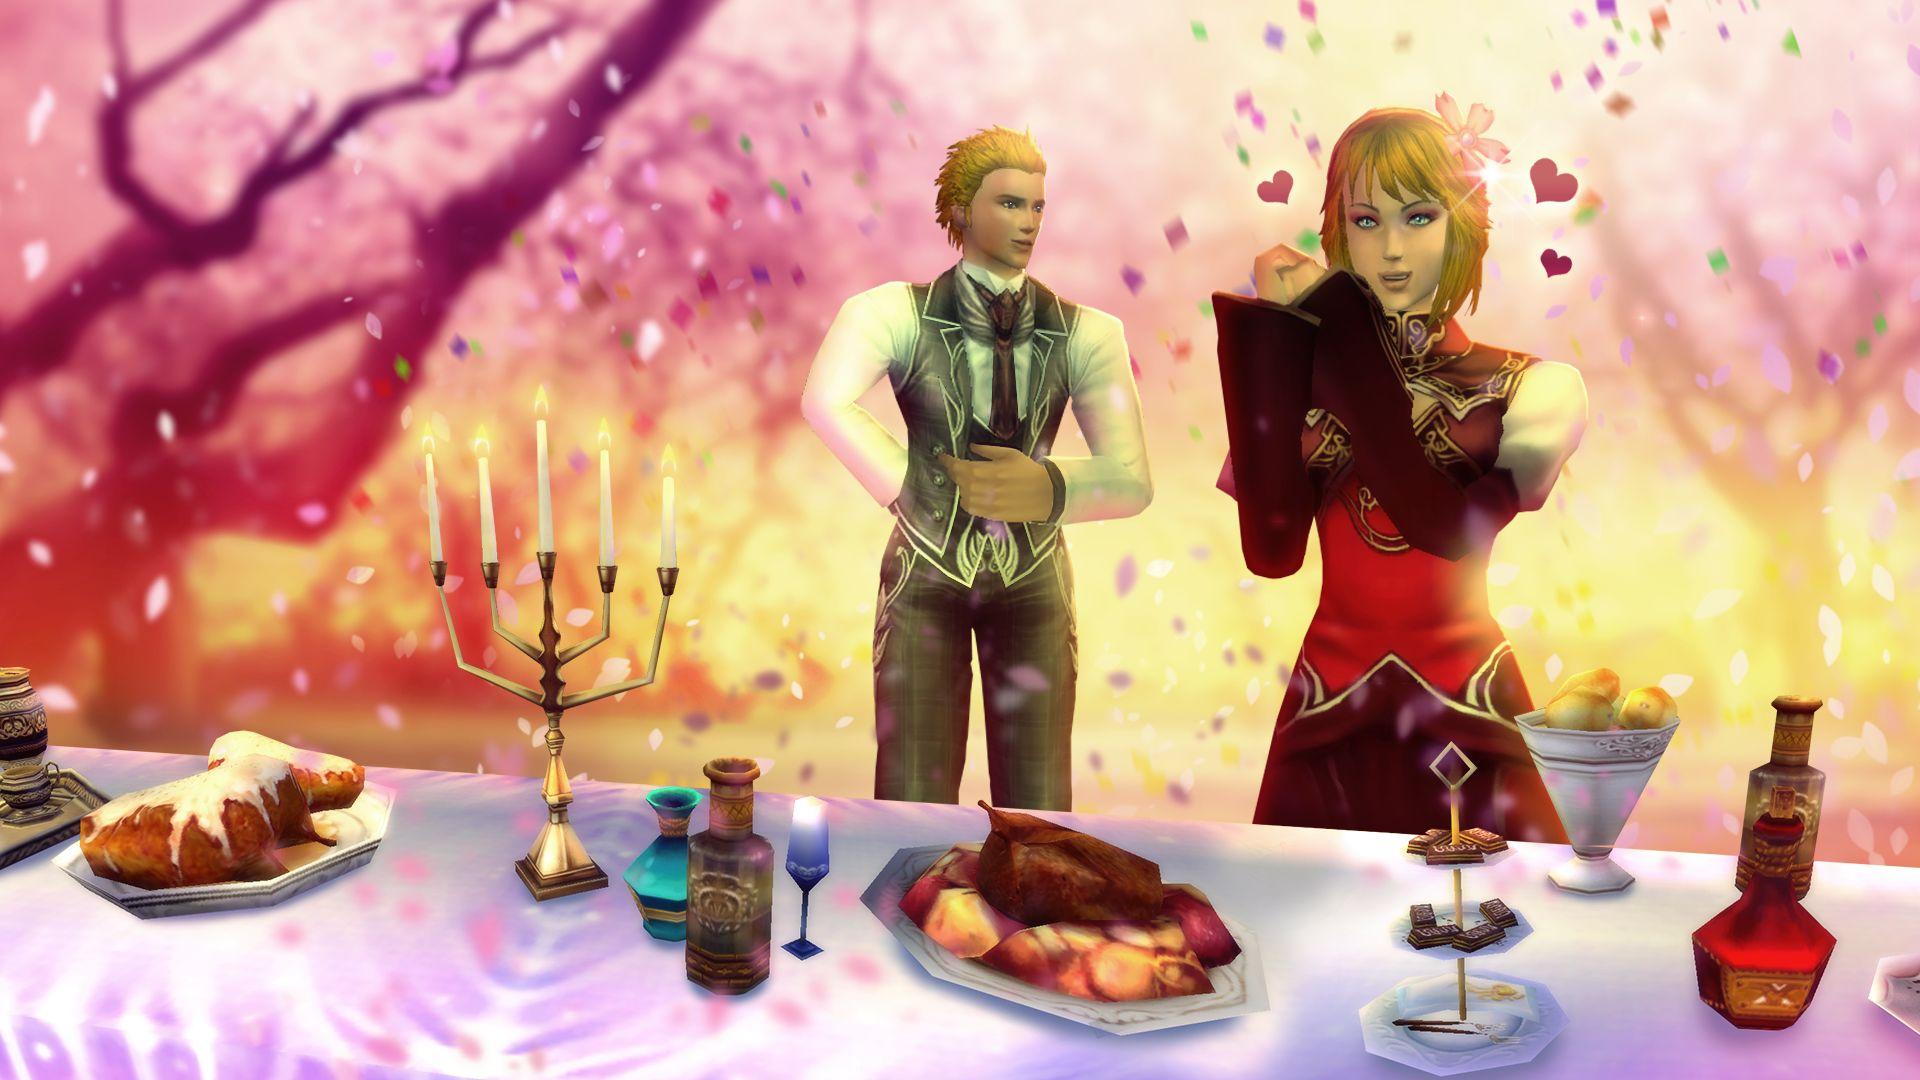 Valentines_Dinner.jpg